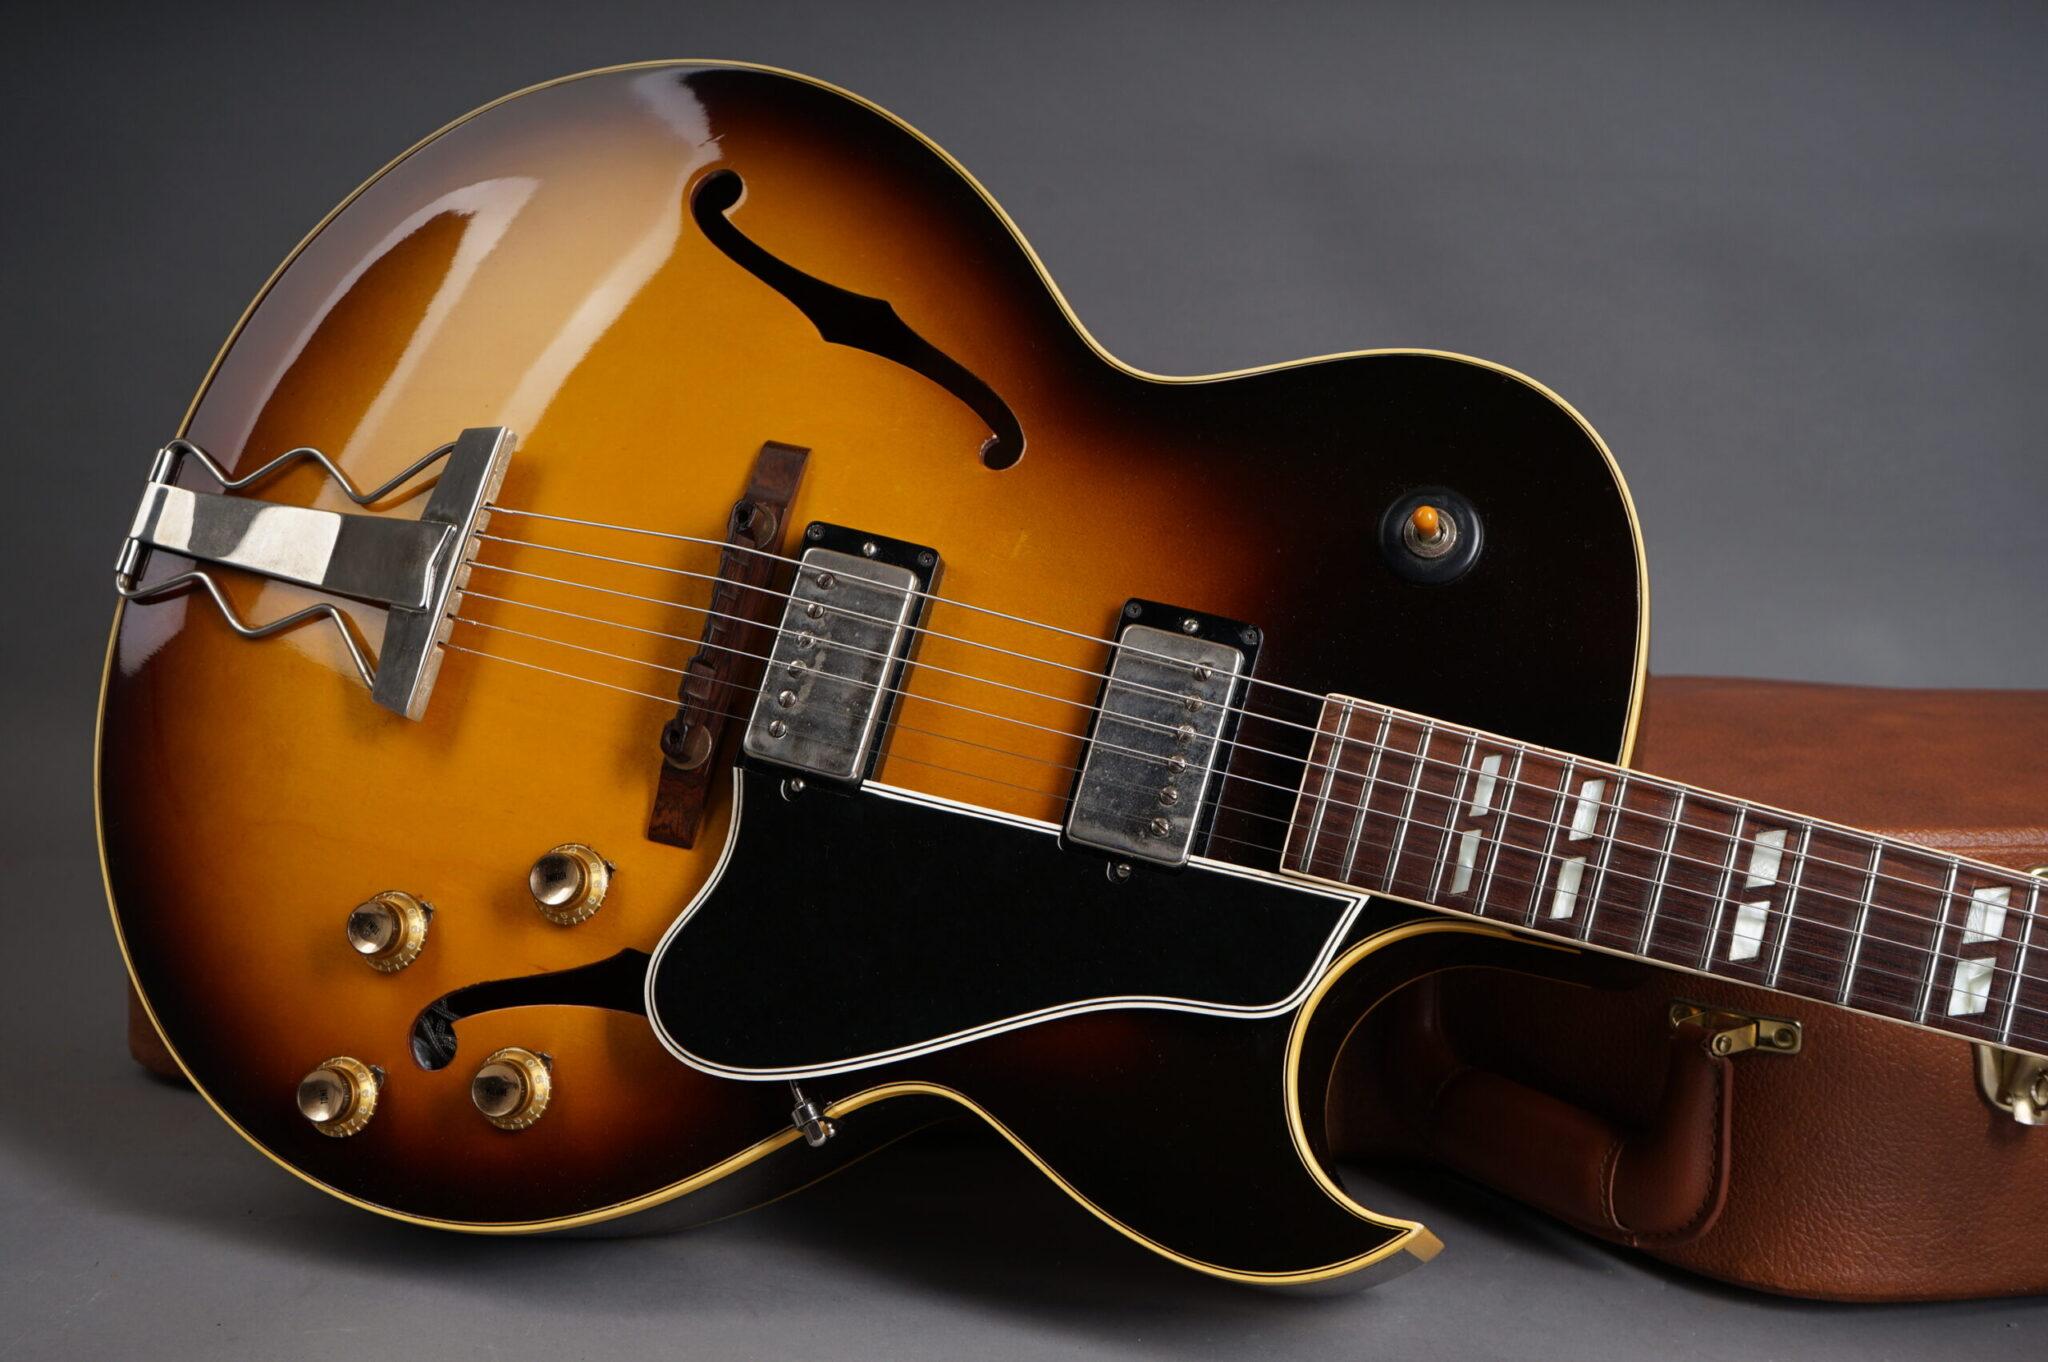 https://guitarpoint.de/app/uploads/products/1961-gibson-es-175d-sunburst/1961-Gibson-ES-175D-37636-8-scaled-2048x1362.jpg